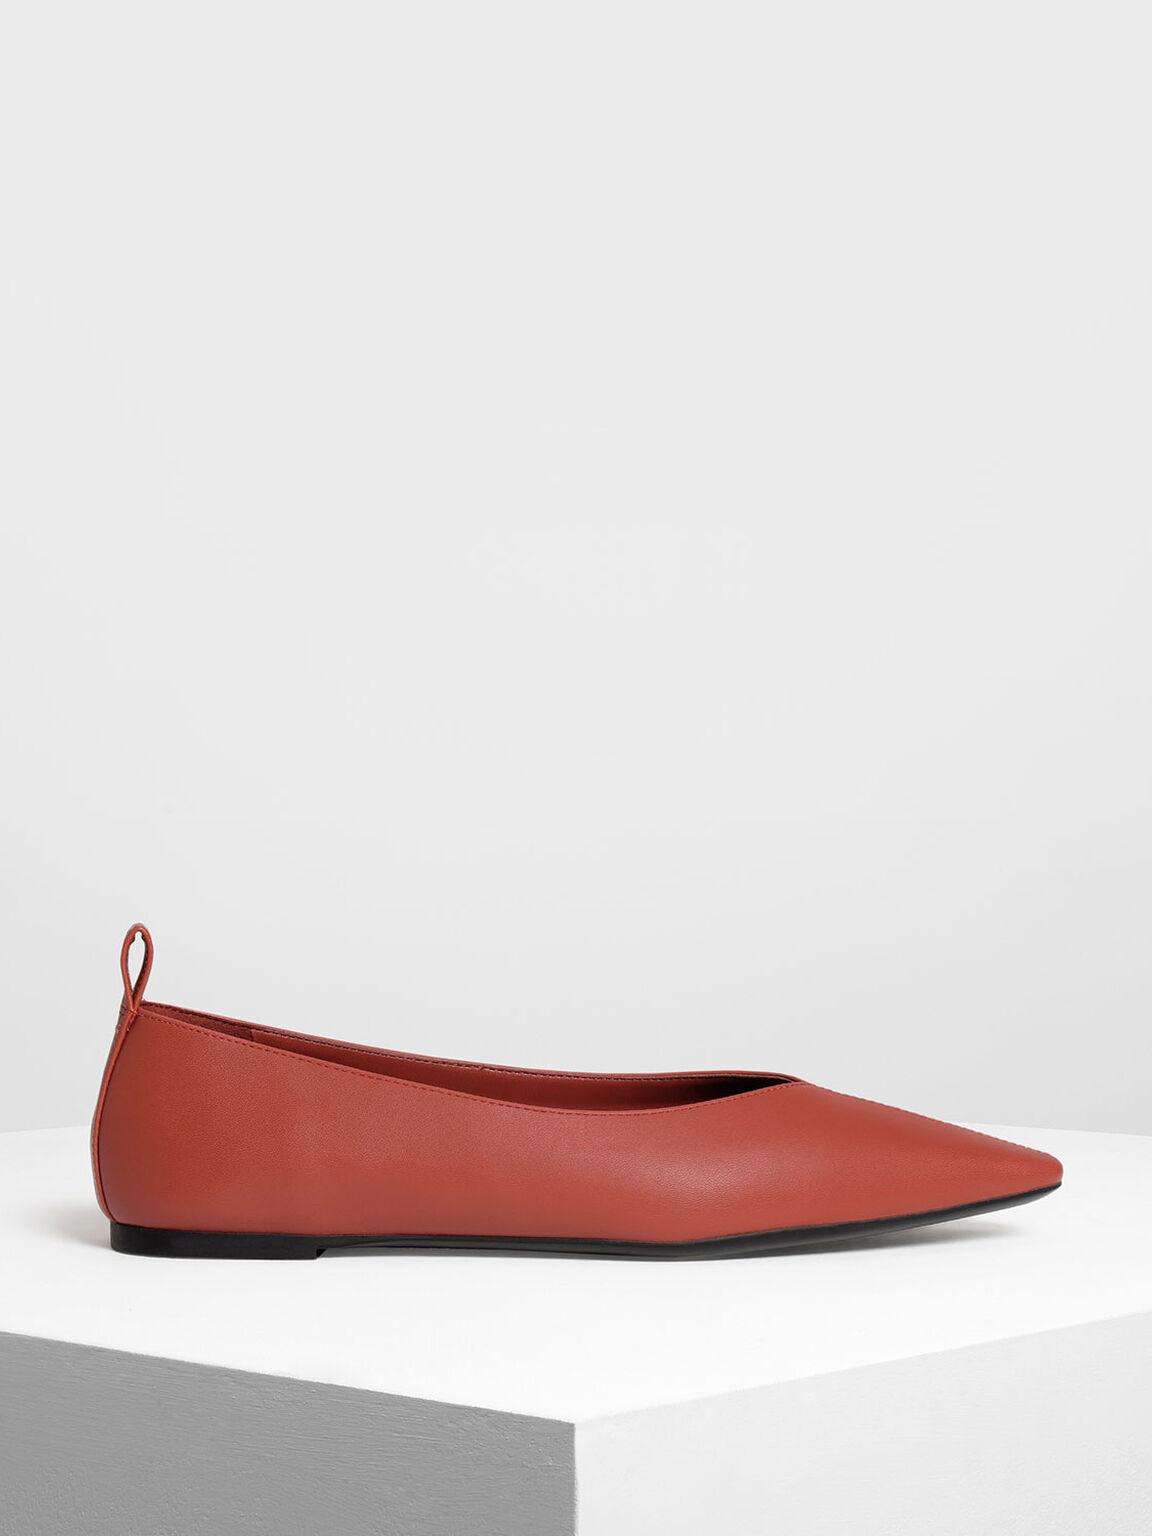 Pointed Toe Flats, Orange, hi-res